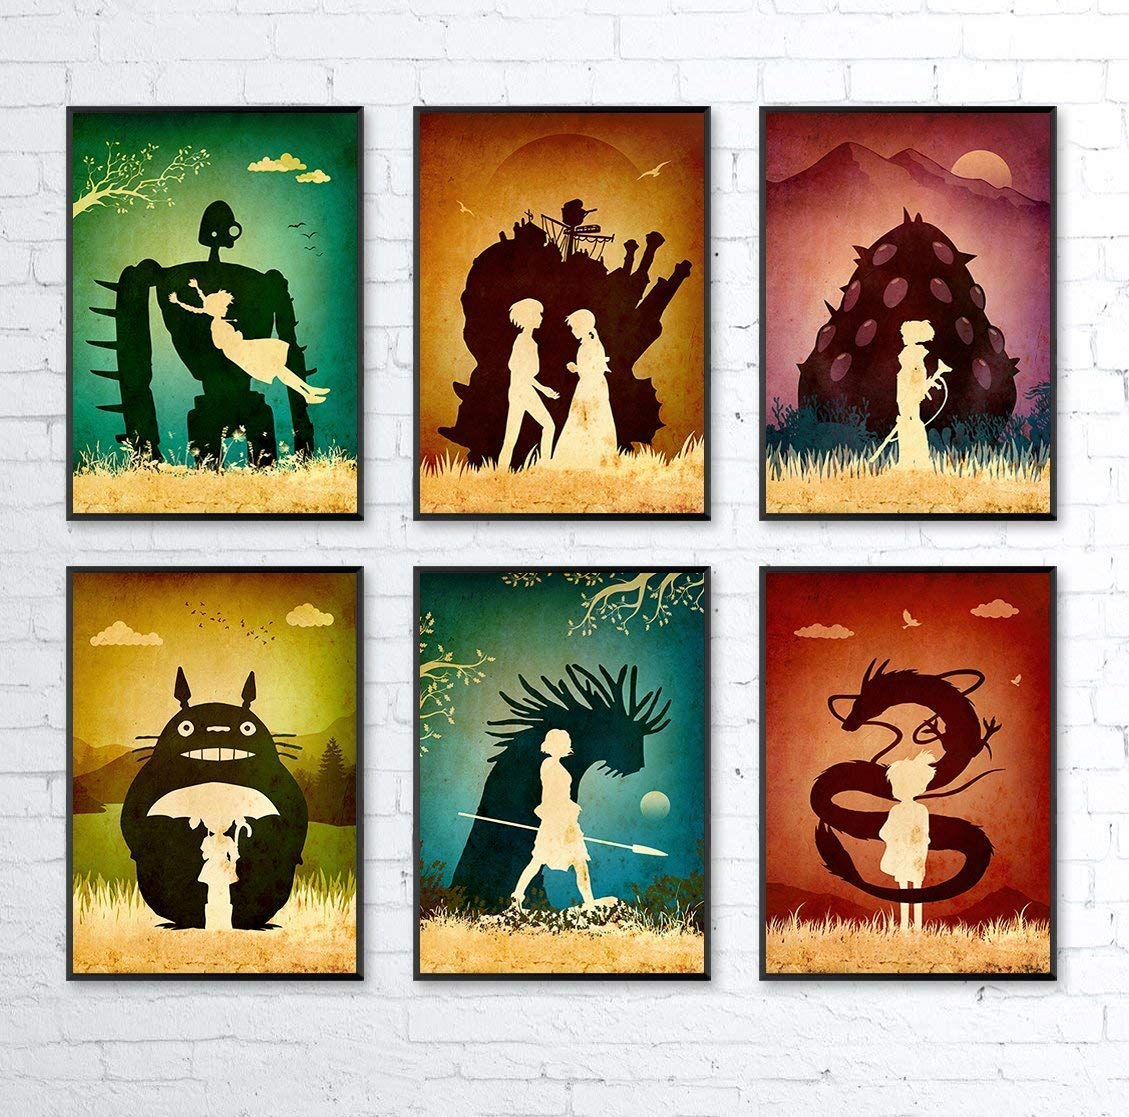 Studio Ghibli Hayao Miyazaki Minimalist Poster Set, Artwork Print, Totoro, Howl's Moving Castle, Mononoke, Nausicaa, Castle in the Sky, Spirited Away, Unframed Print, Office Decor, Home Decor